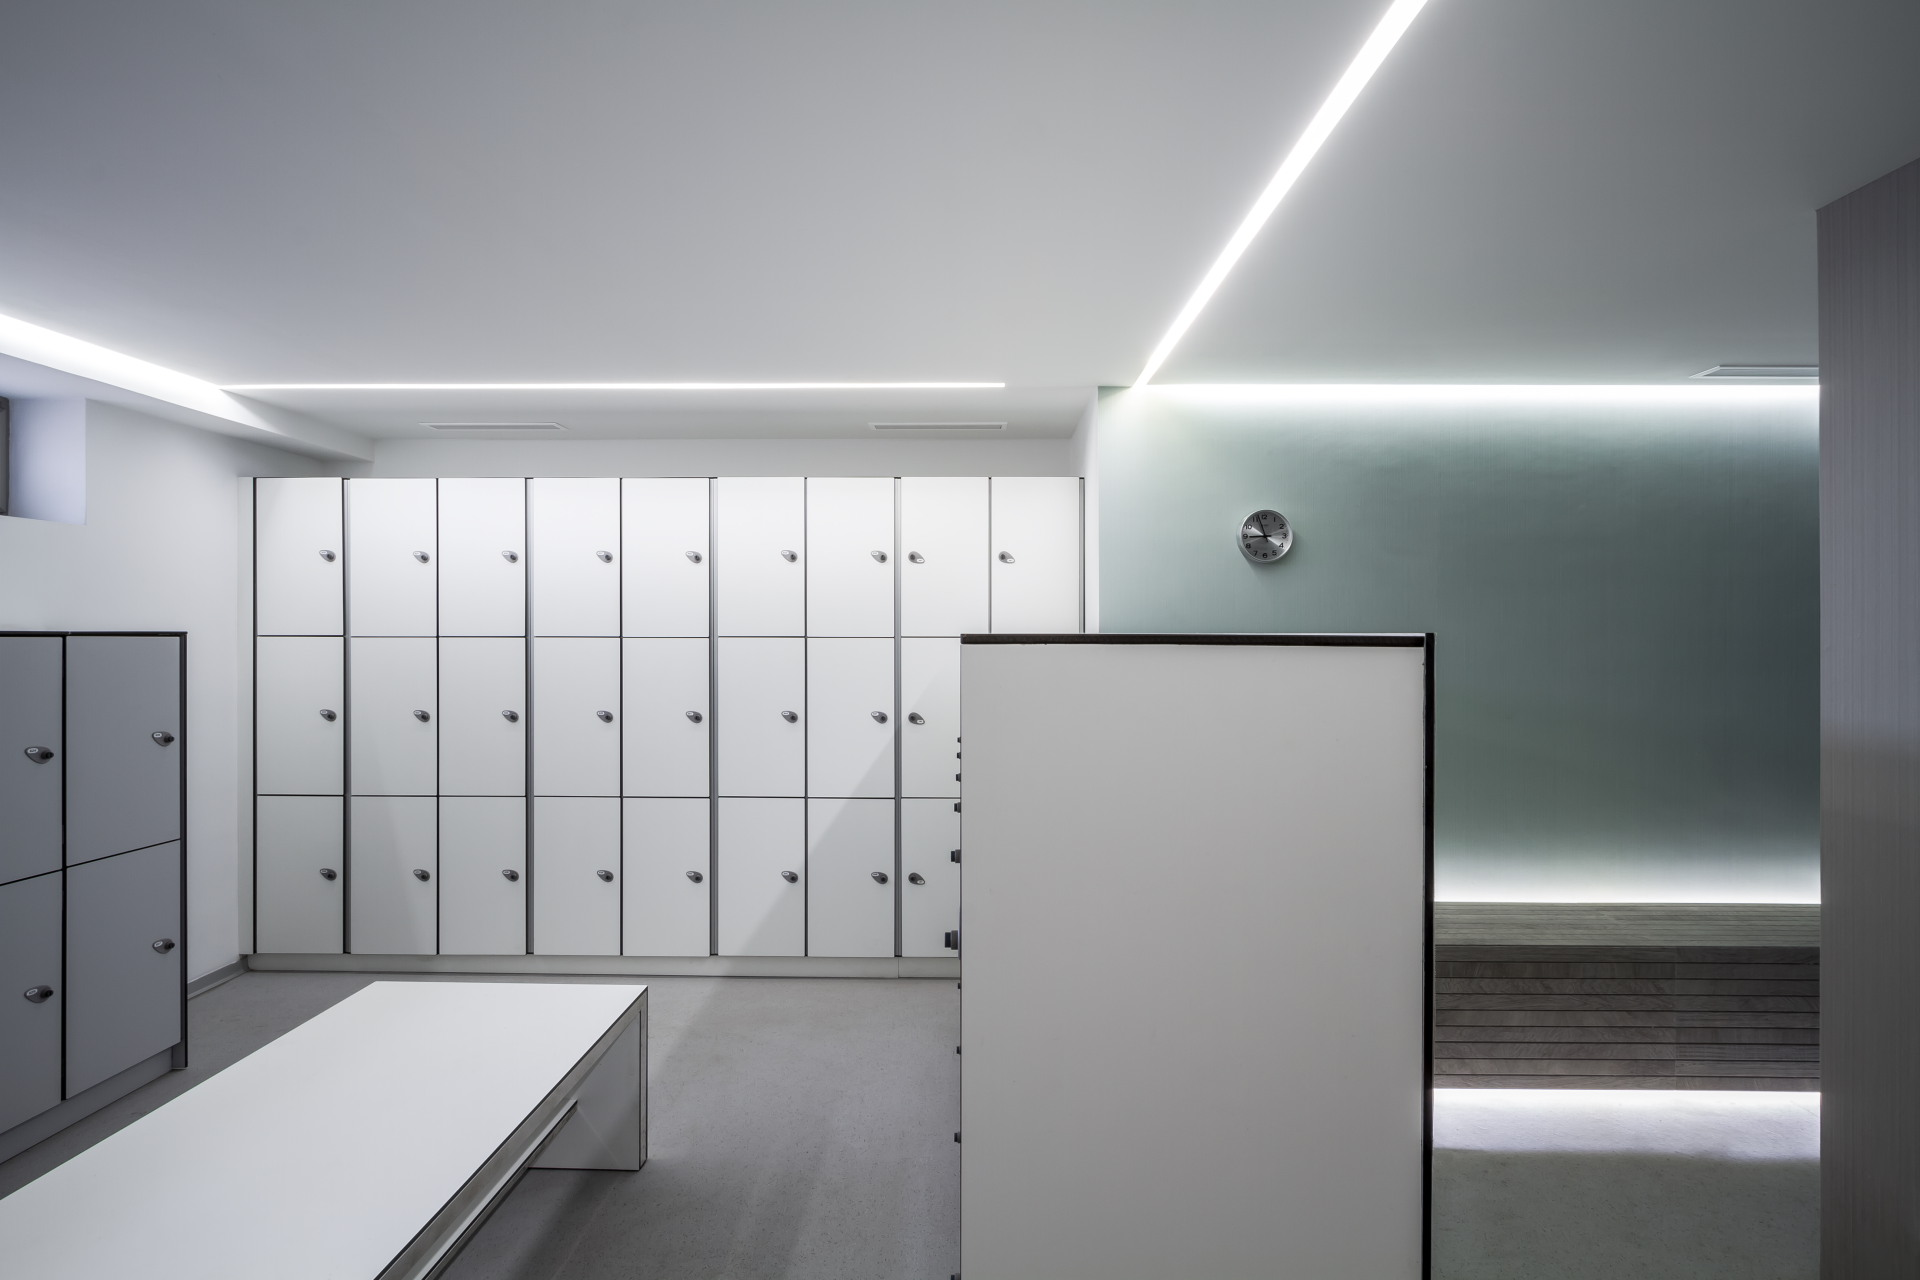 fotografia-arquitectura-valencia-german-cabo-bfm-edificatoria-club-tenis (11)